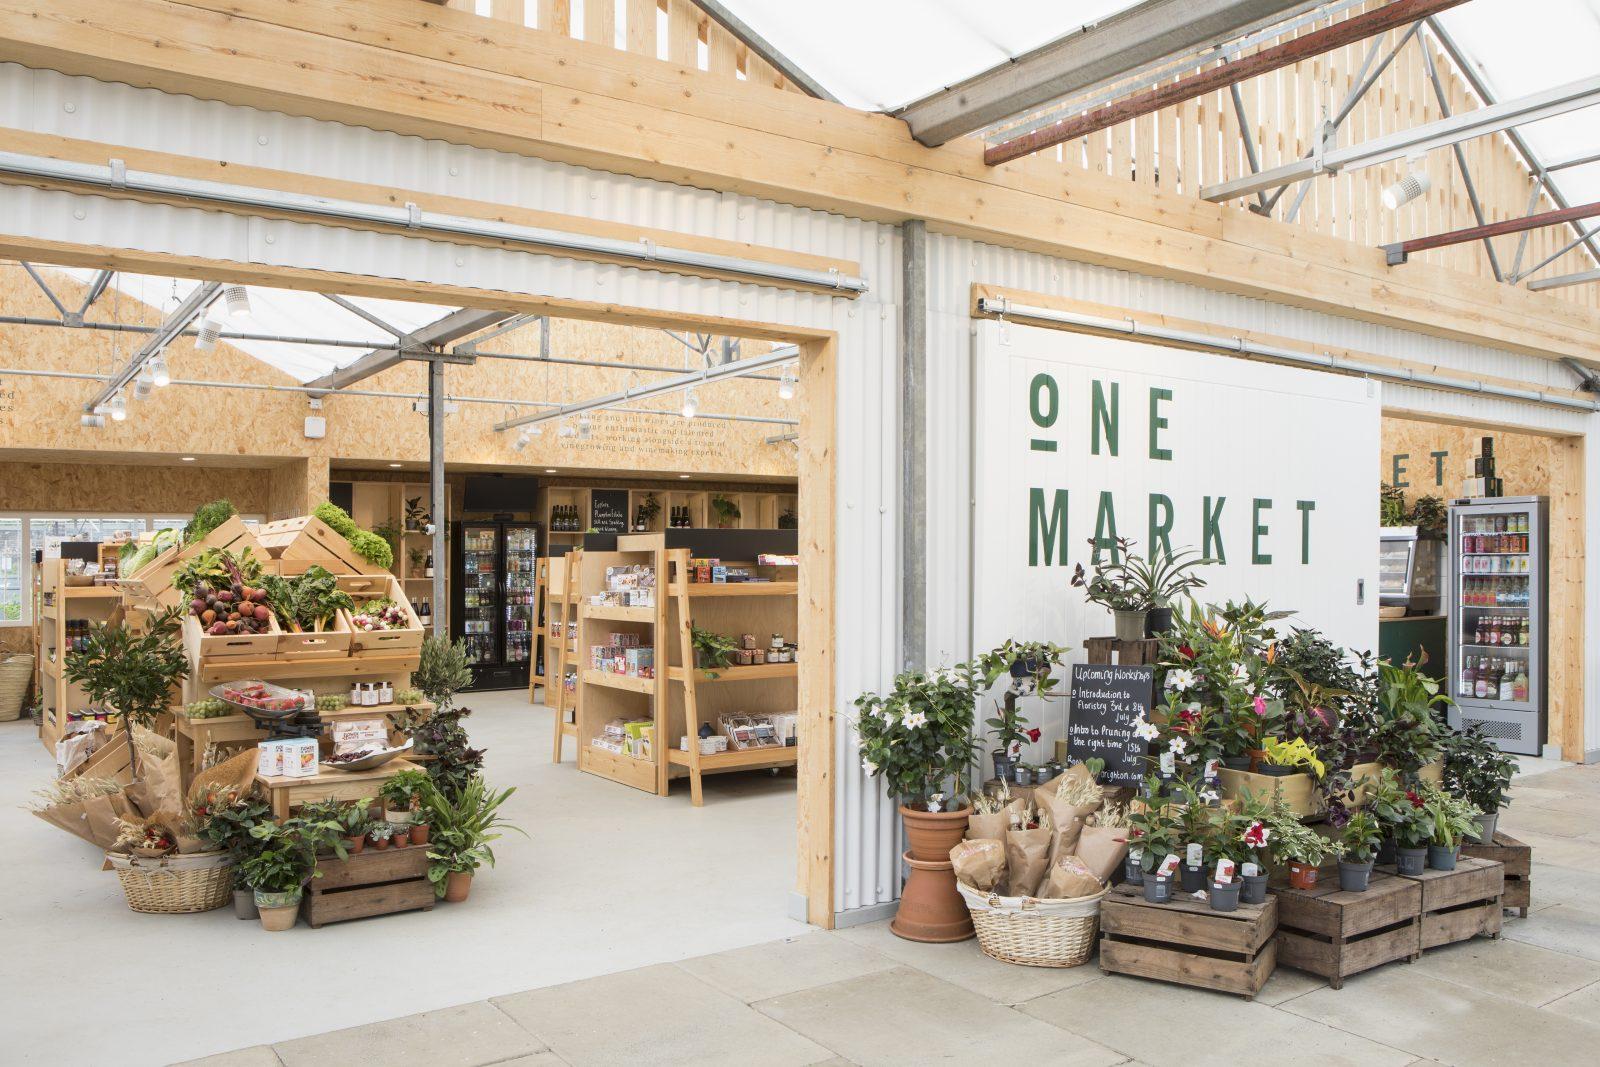 One Garden Market interiors project